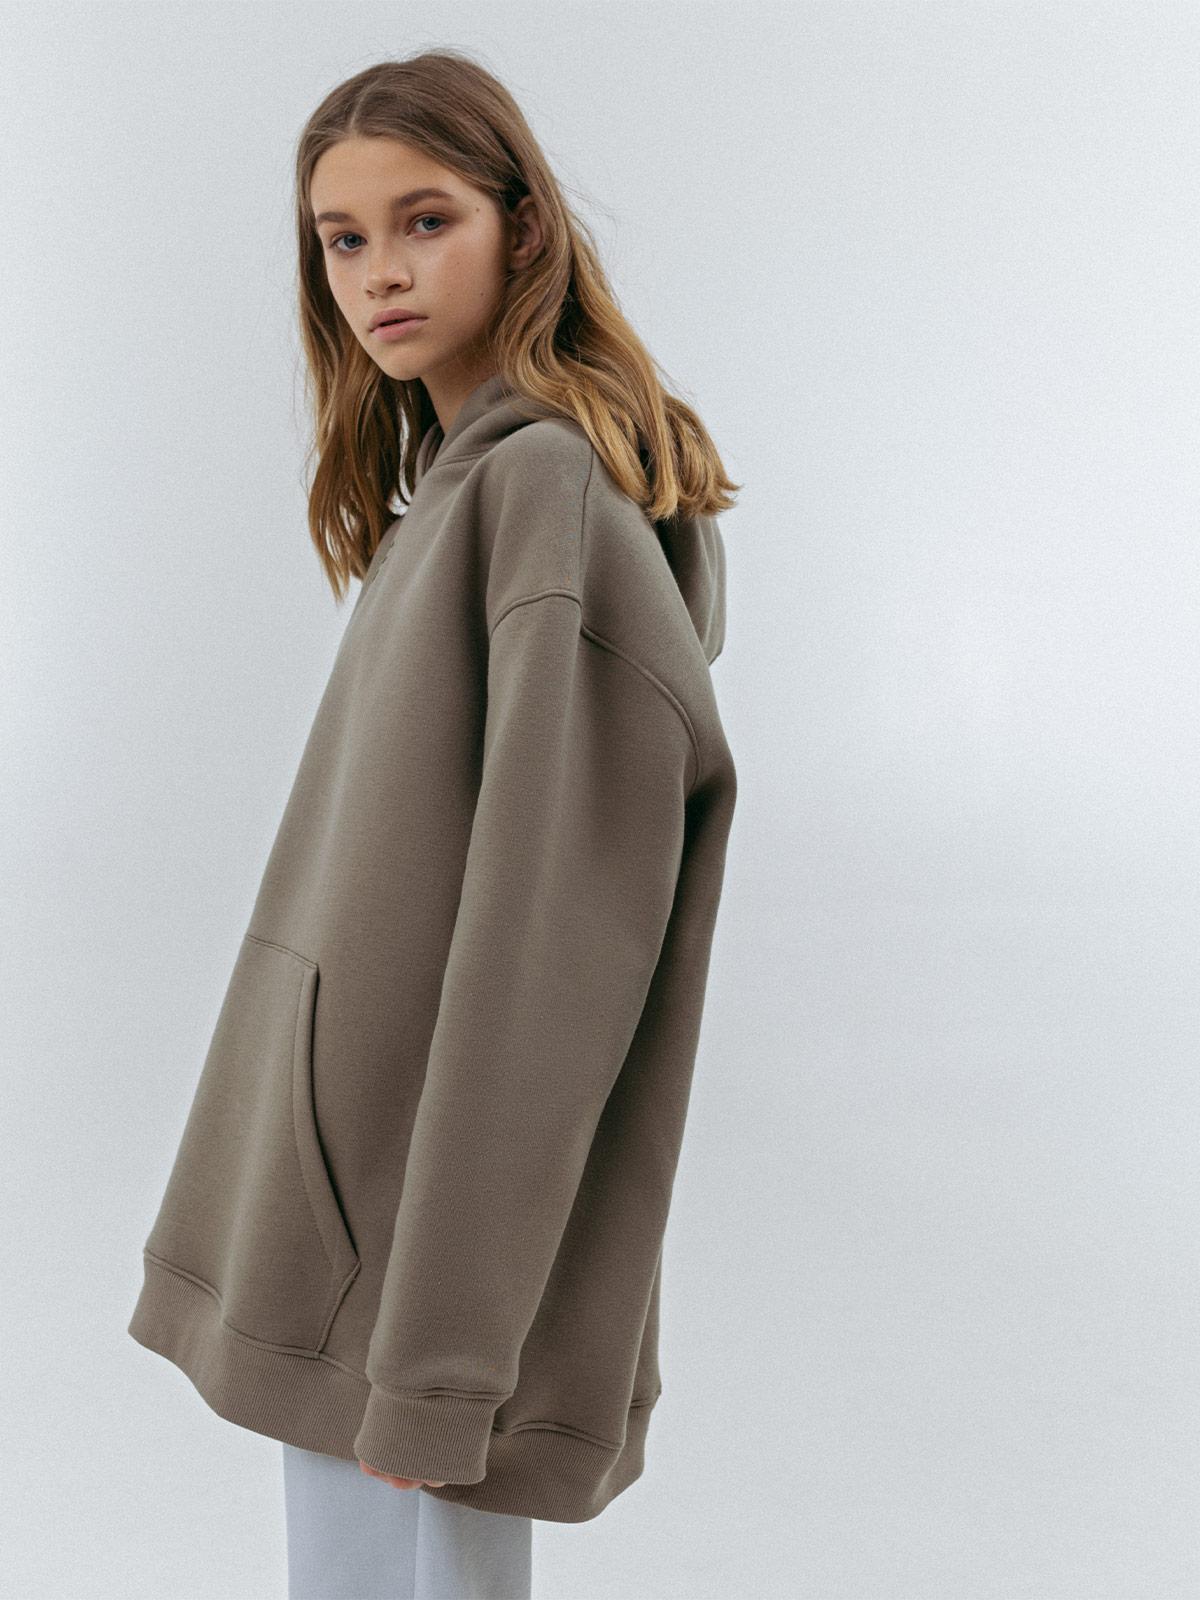 rcc-sport-olive-oversized-hoodie-2